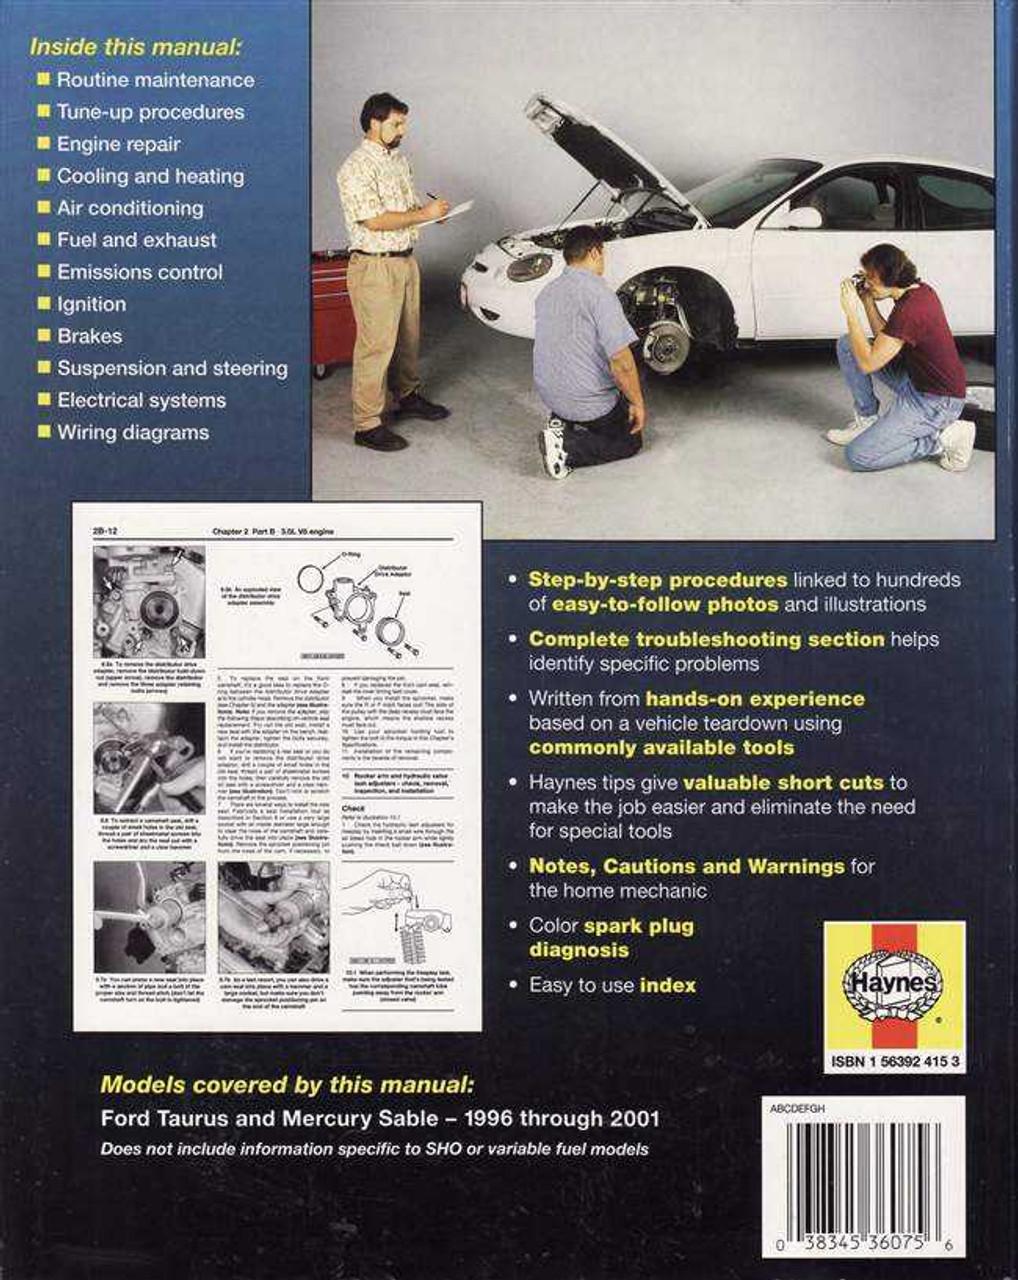 medium resolution of ford taurus and mercury sable 1996 2001 workshop manual 96 mercury sable exhaust diagram